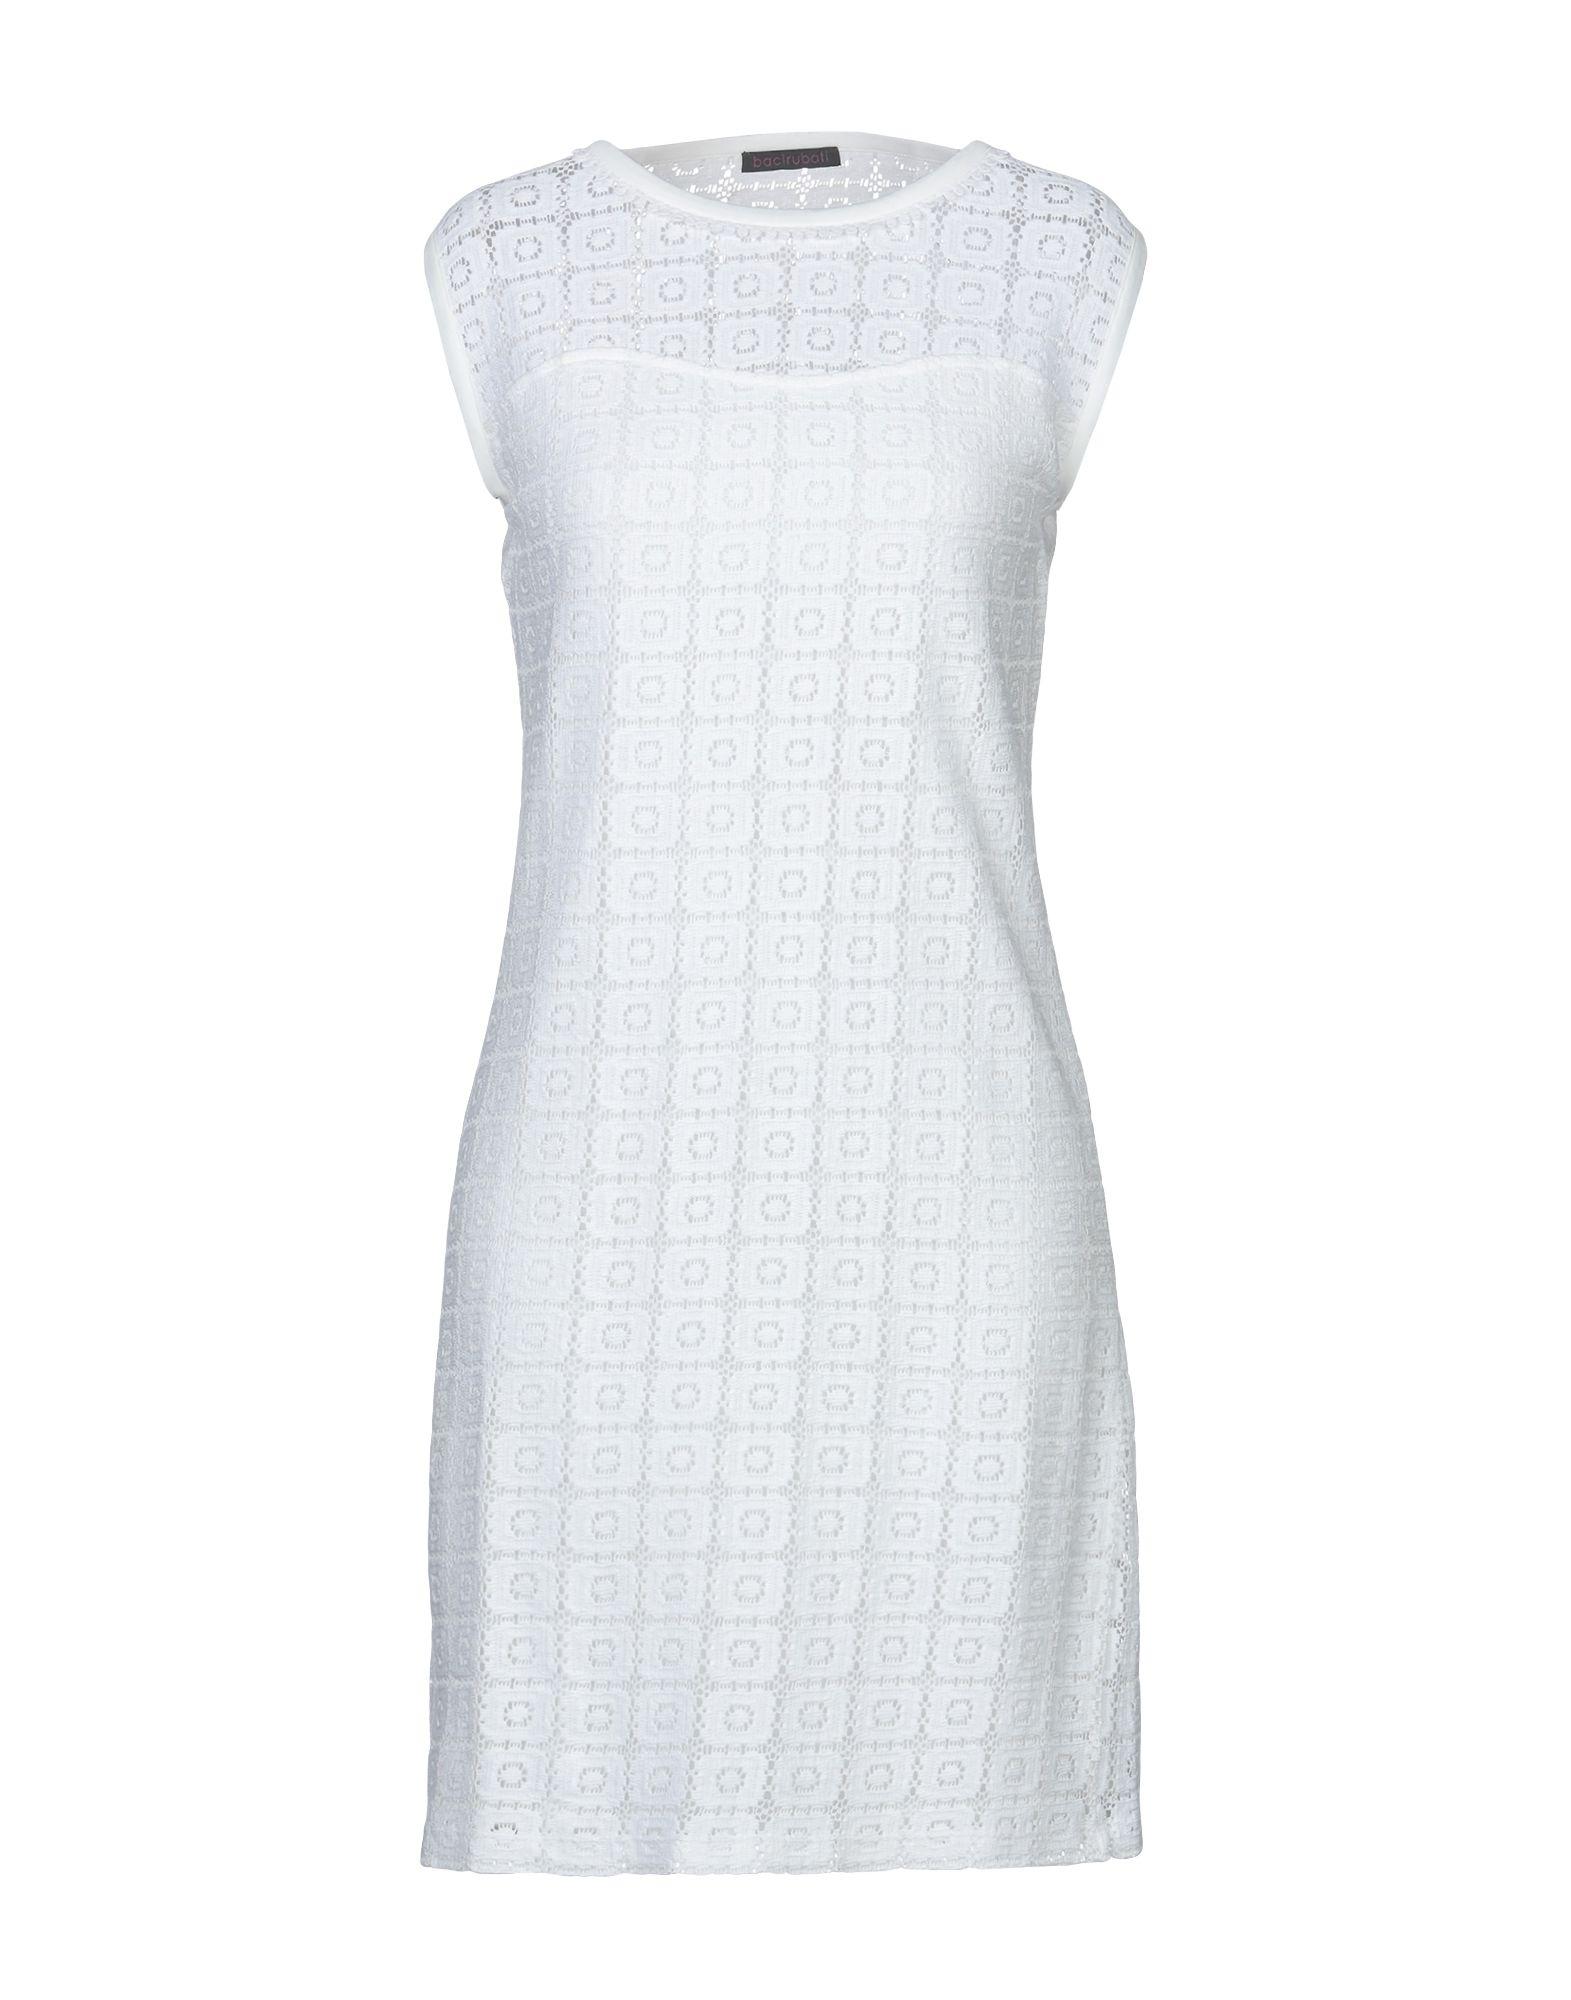 BACI RUBATI Короткое платье baci шаловливая медсестра топ трусики и мини юбка